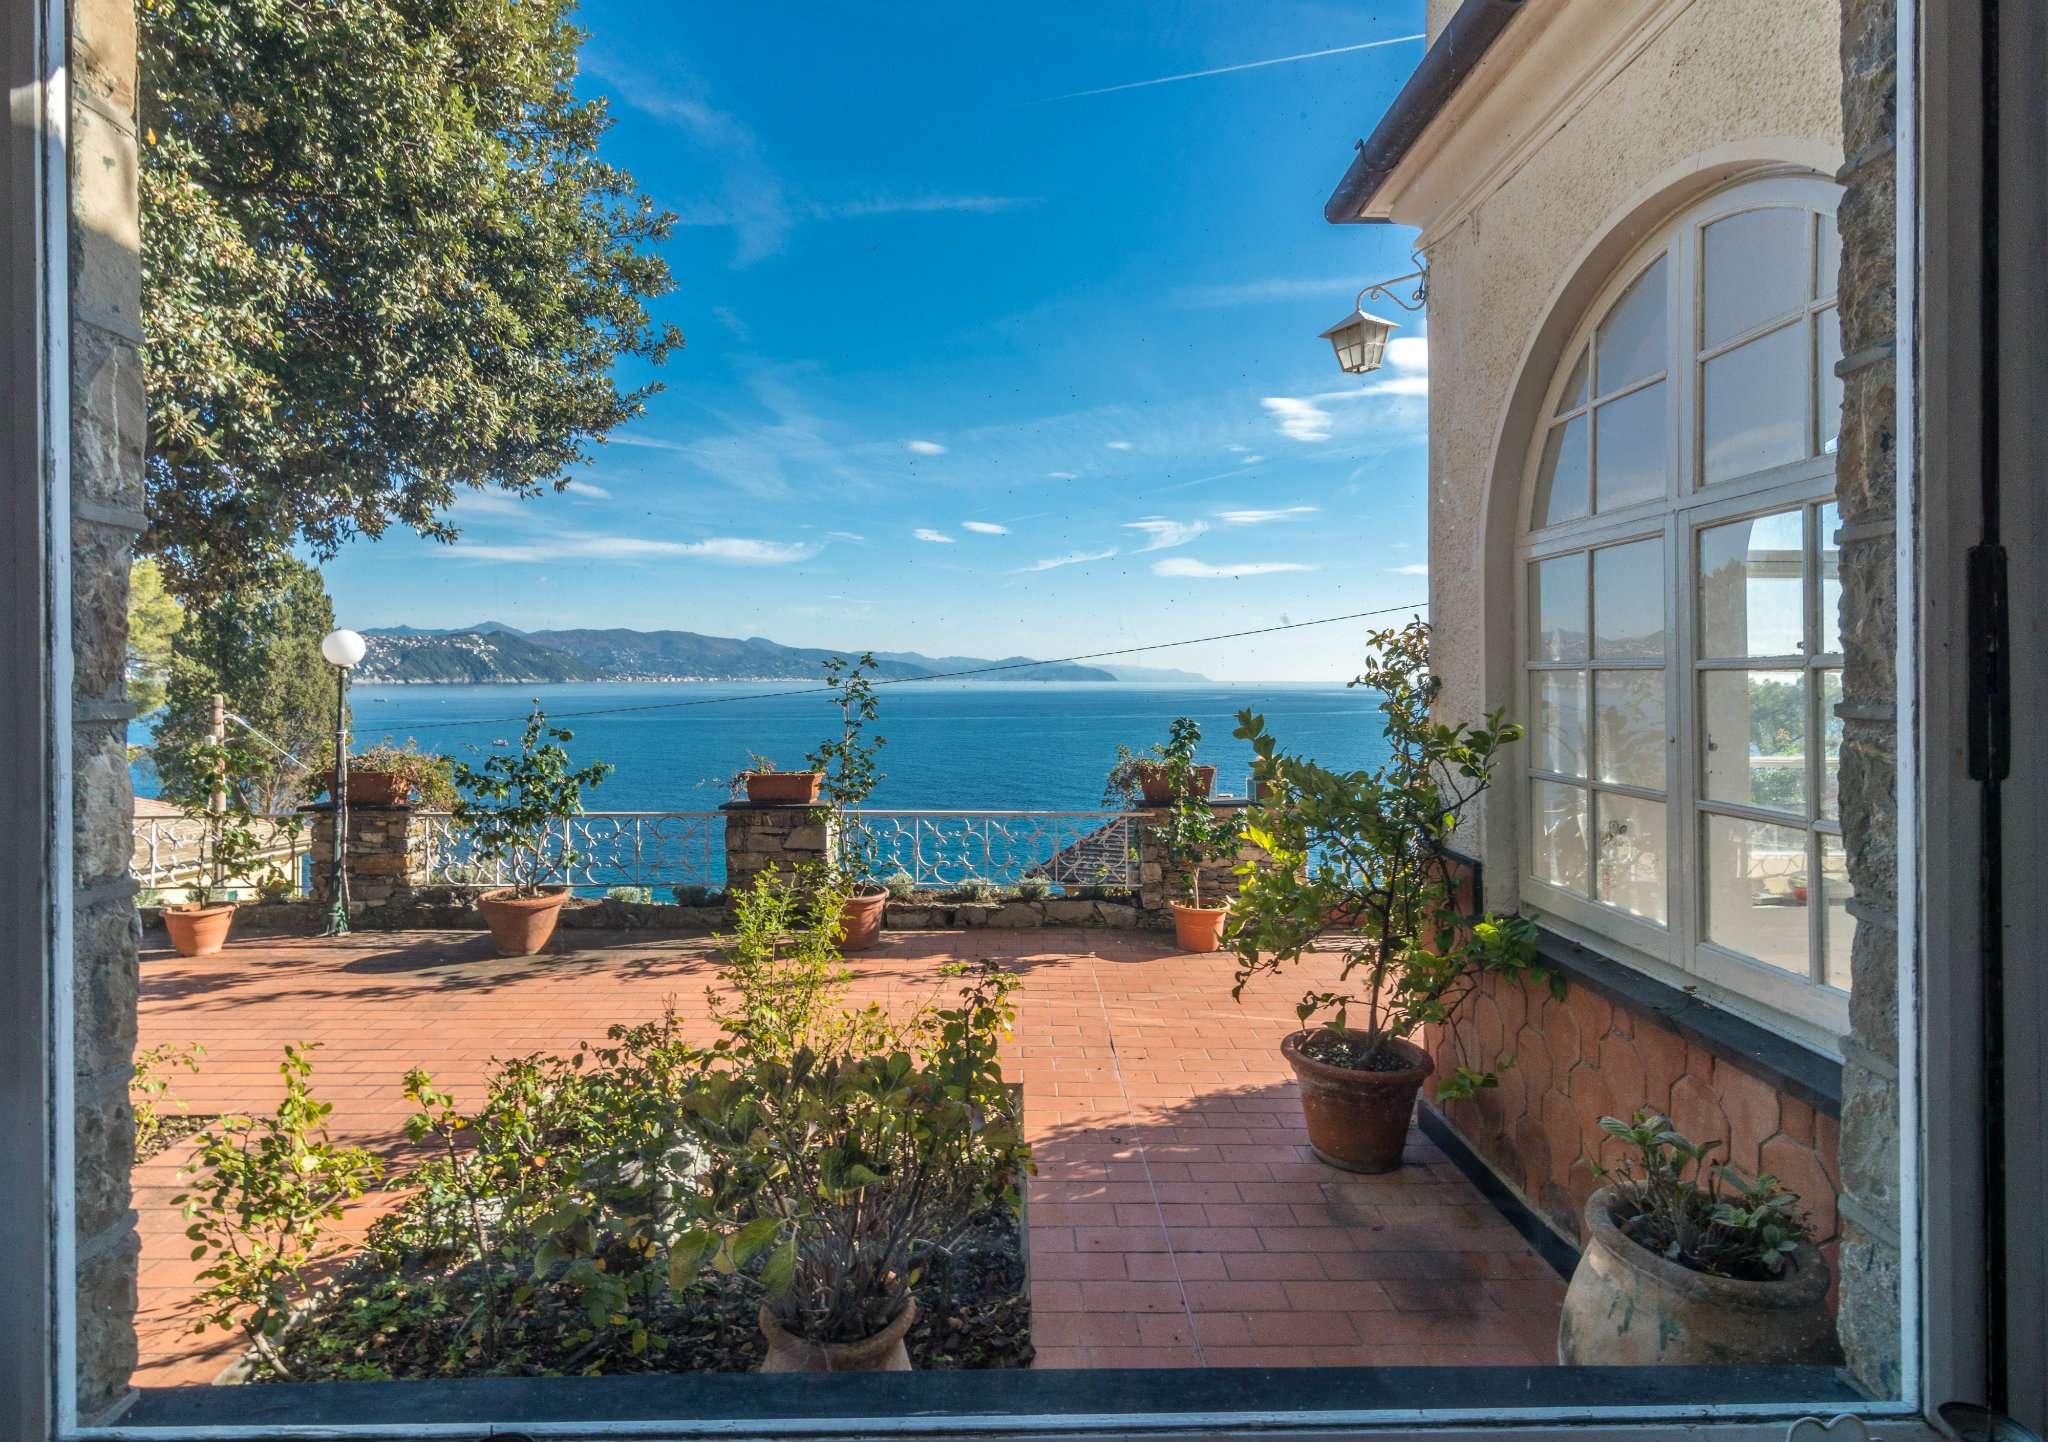 Villa in Vendita a Santa Margherita Ligure: 5 locali, 545 mq - Foto 14